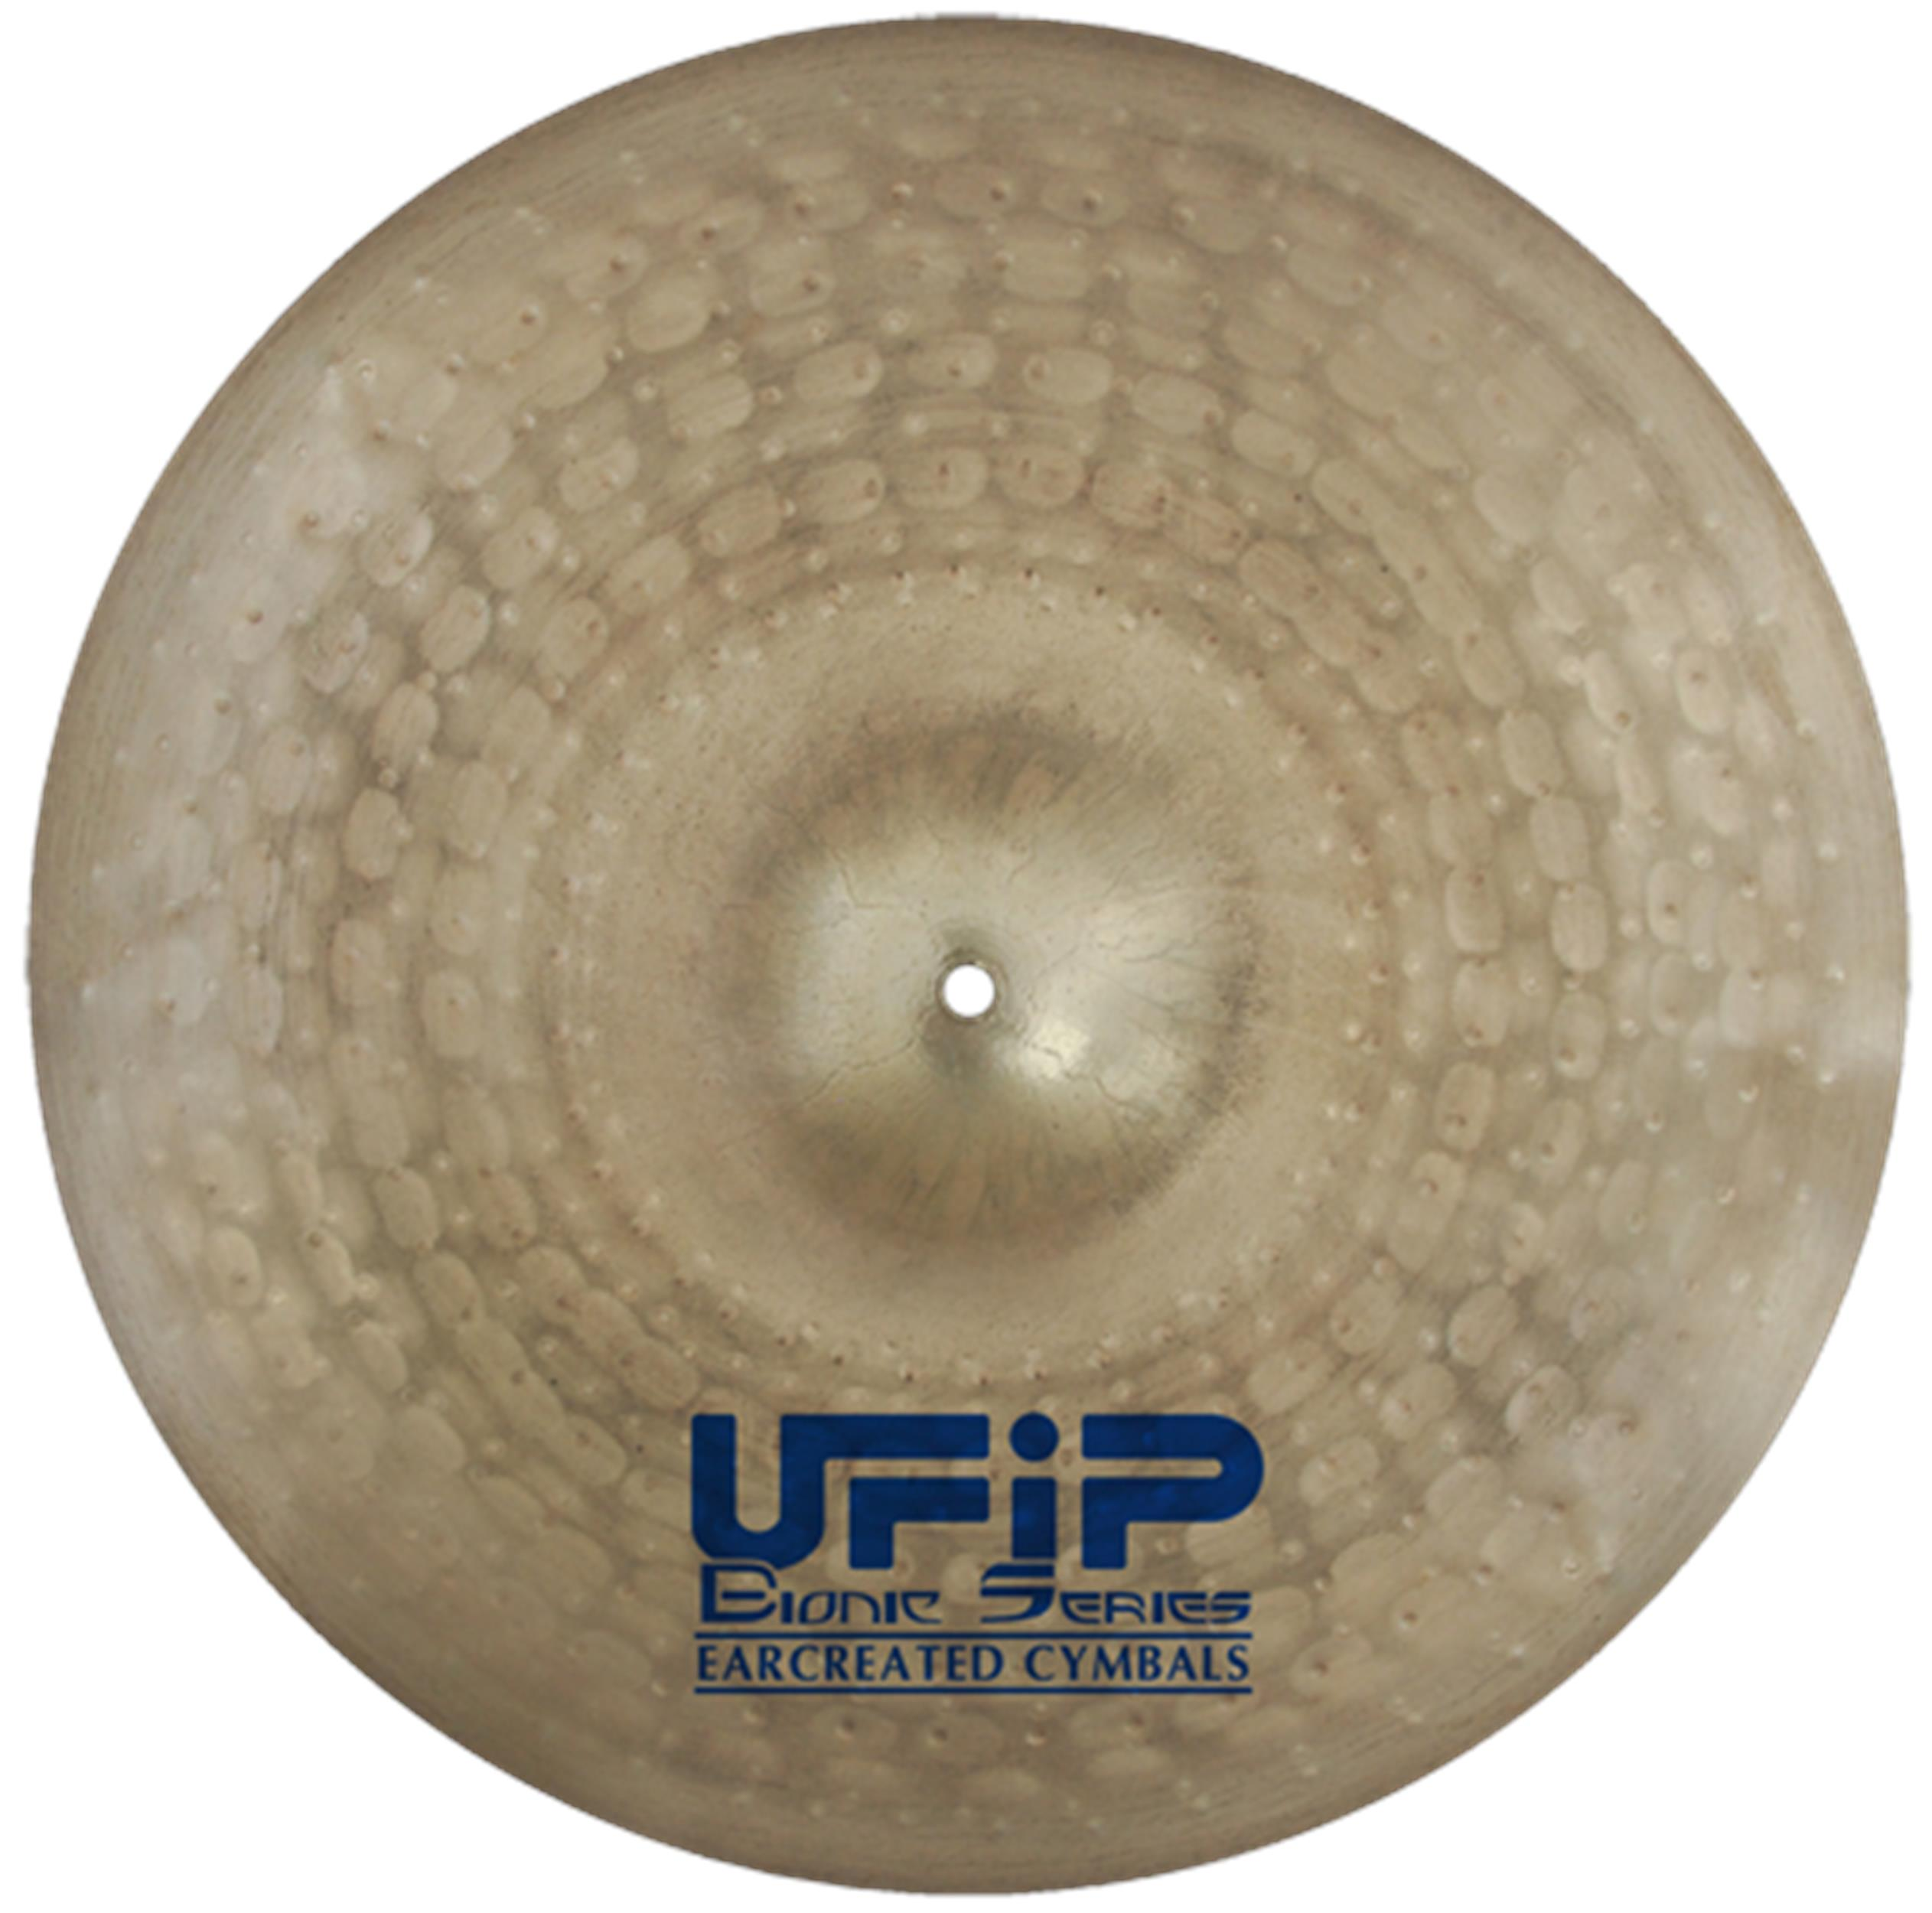 UFIP-BI-22HR-Bionic-Series-22-Heavy-Ride-sku-45600016